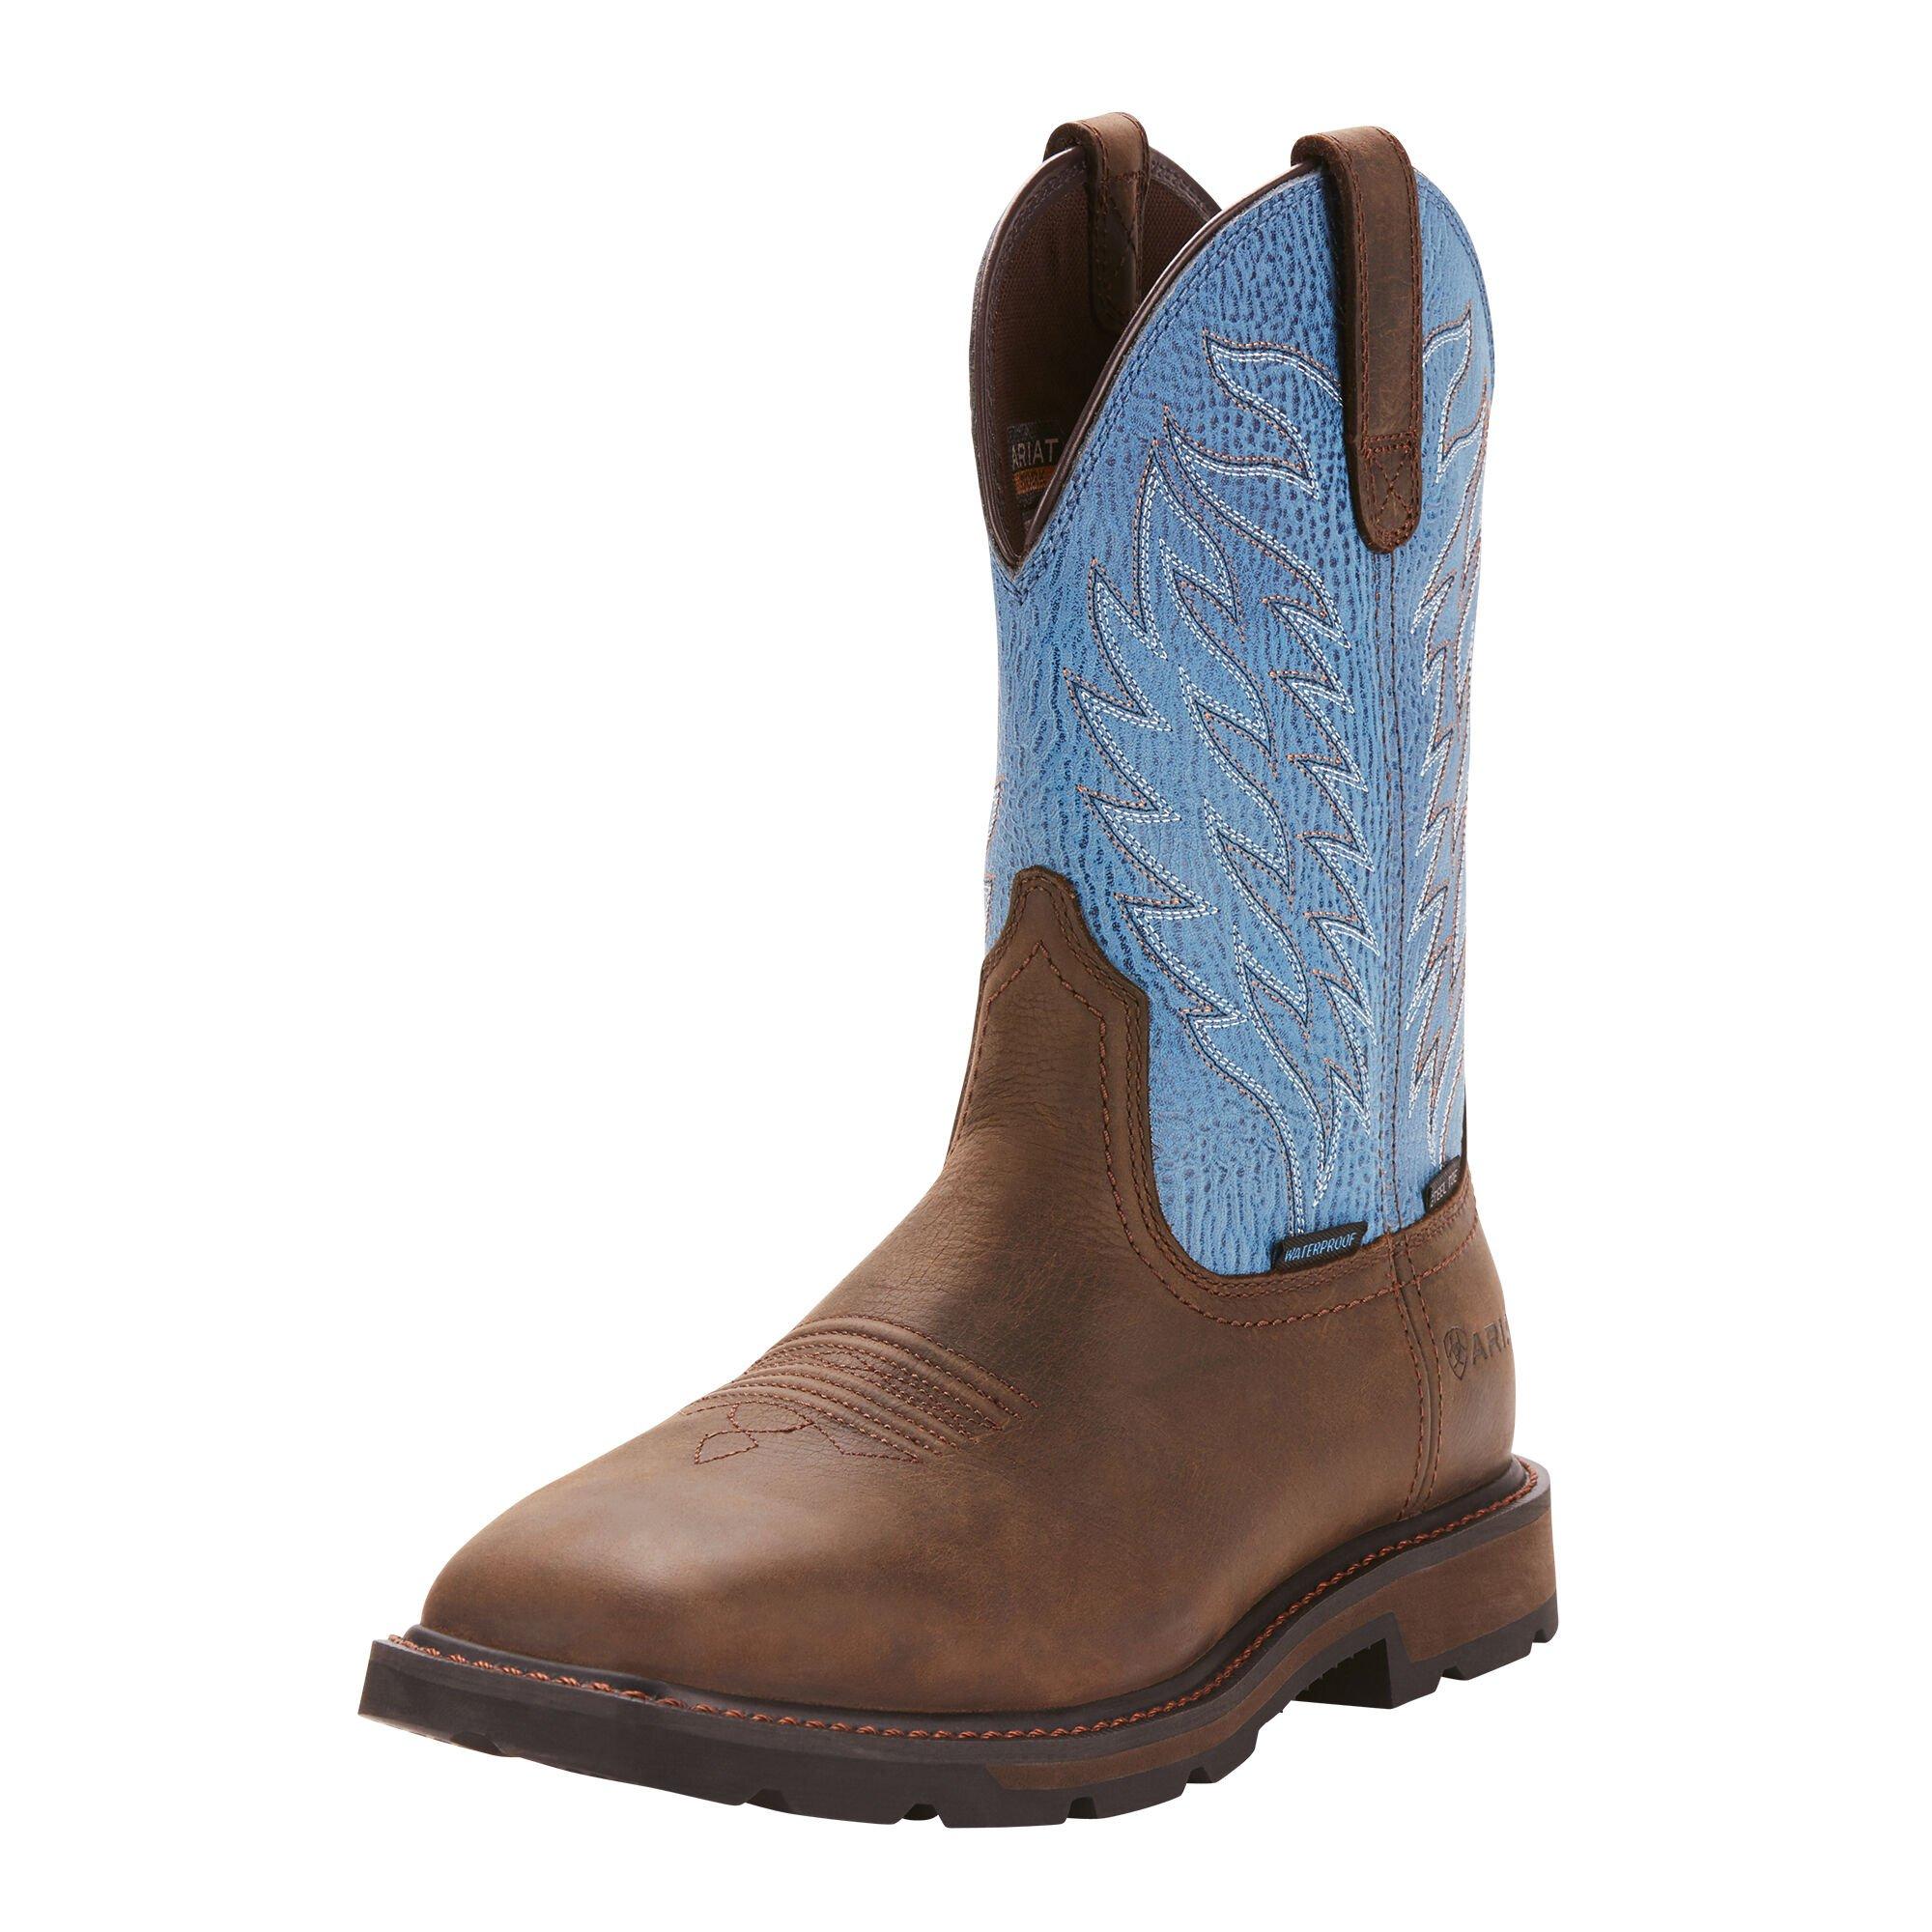 Groundbreaker Wide Square Toe Waterproof Steel Toe Work Boot